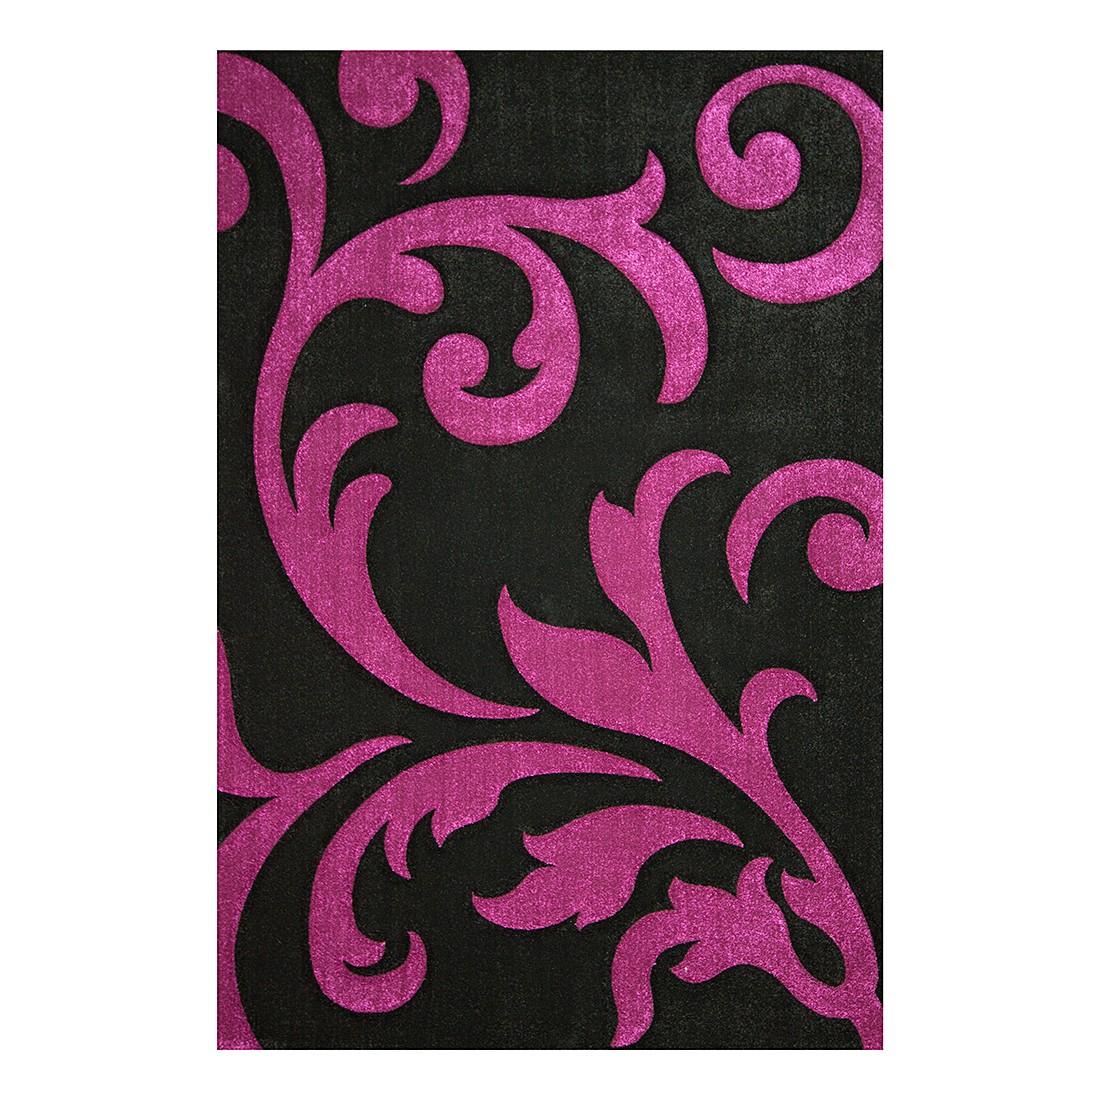 Teppich Paris – Multicolor – 200 x 290 cm, Kayoom online kaufen